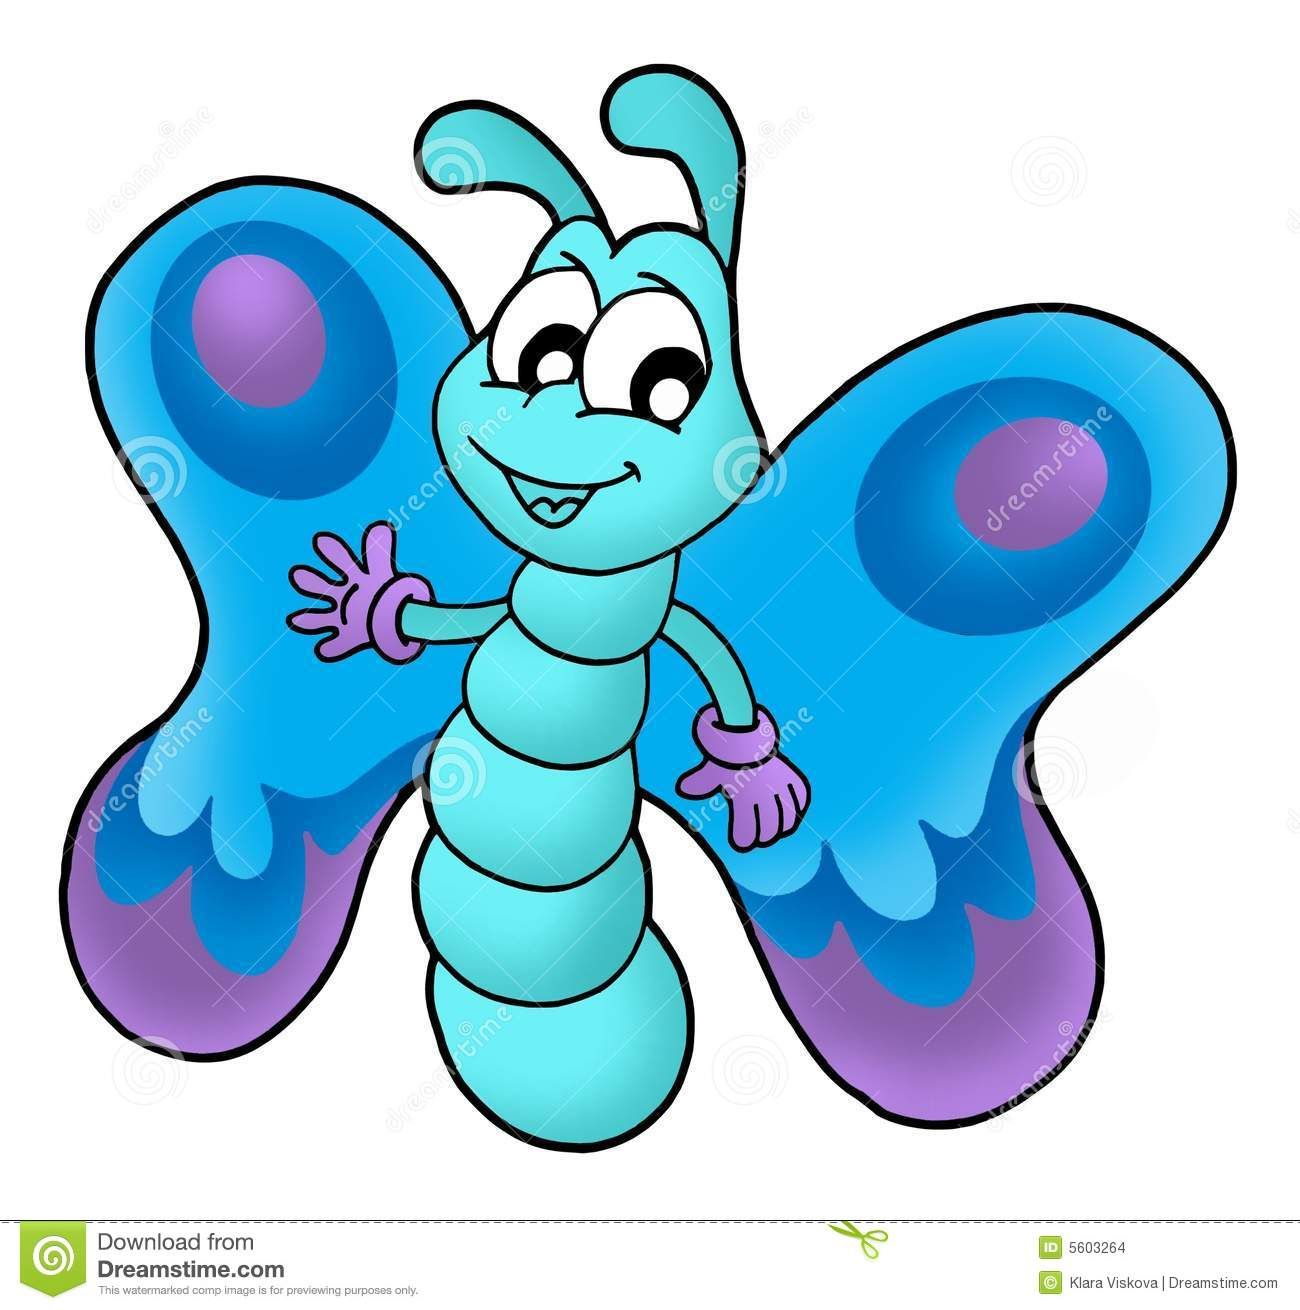 Caterpillar clipart adorable. Cute butterfly graphics panda